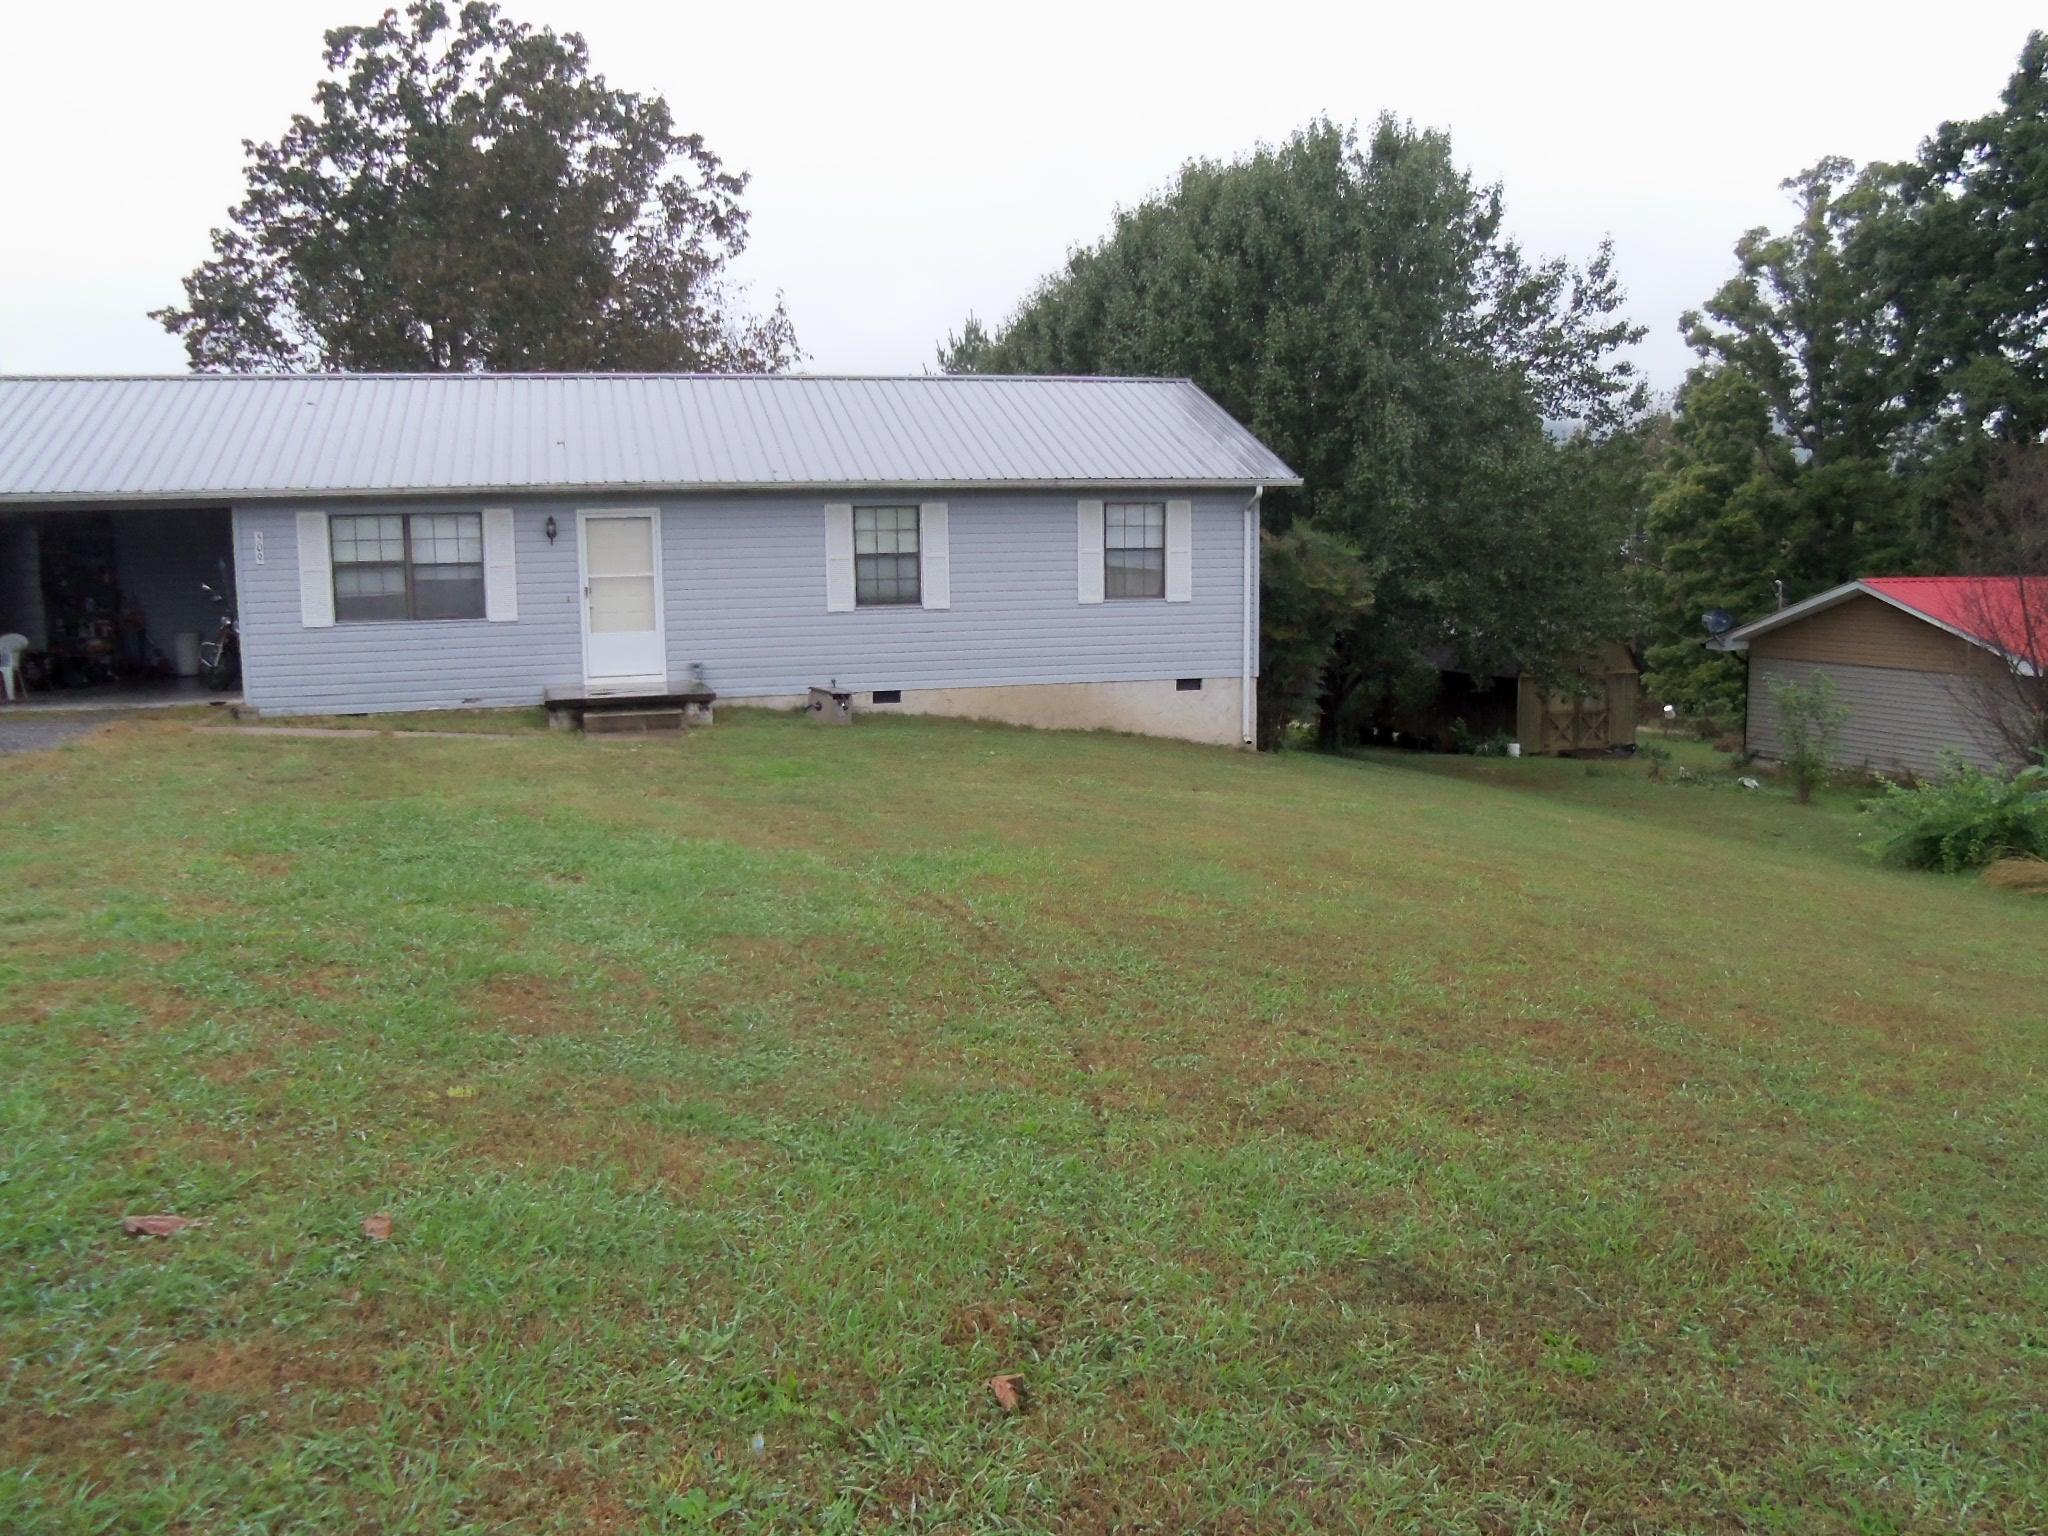 509 Mcdowell Rd, Dunlap, TN 37327